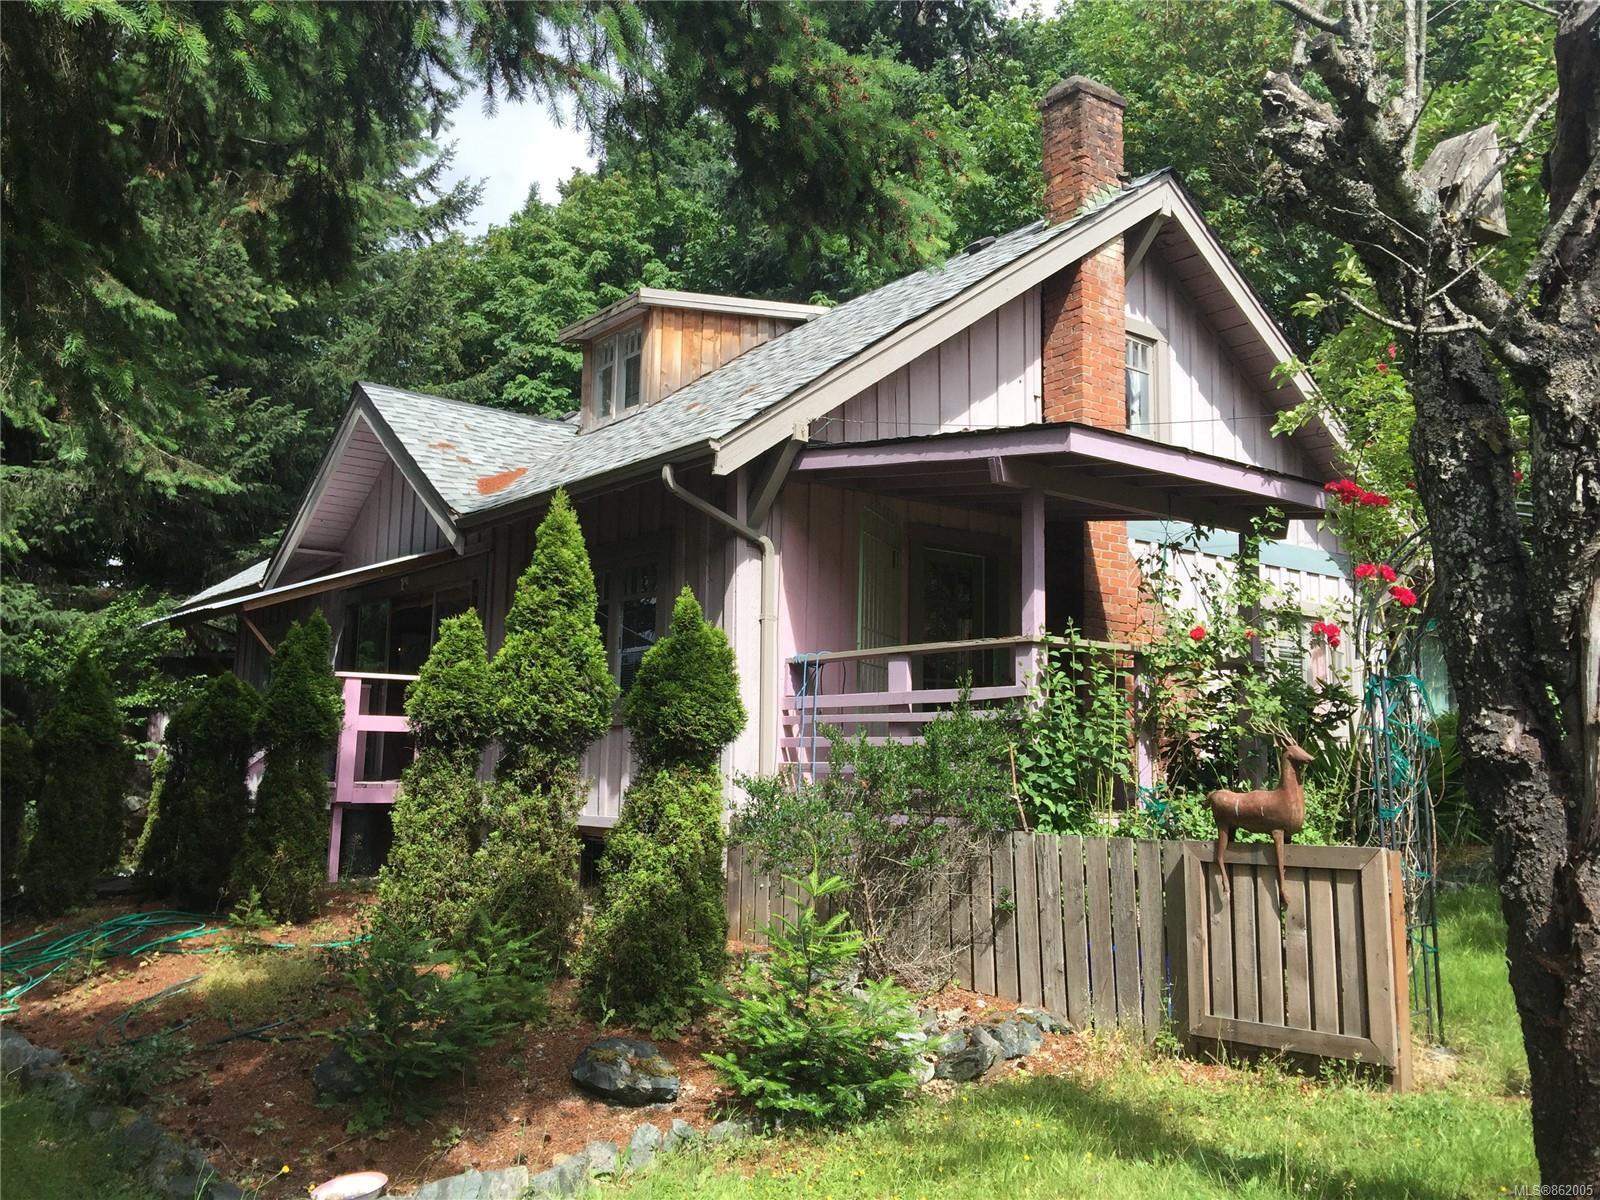 Main Photo: 4975 Redford St in : PA Port Alberni House for sale (Port Alberni)  : MLS®# 862005